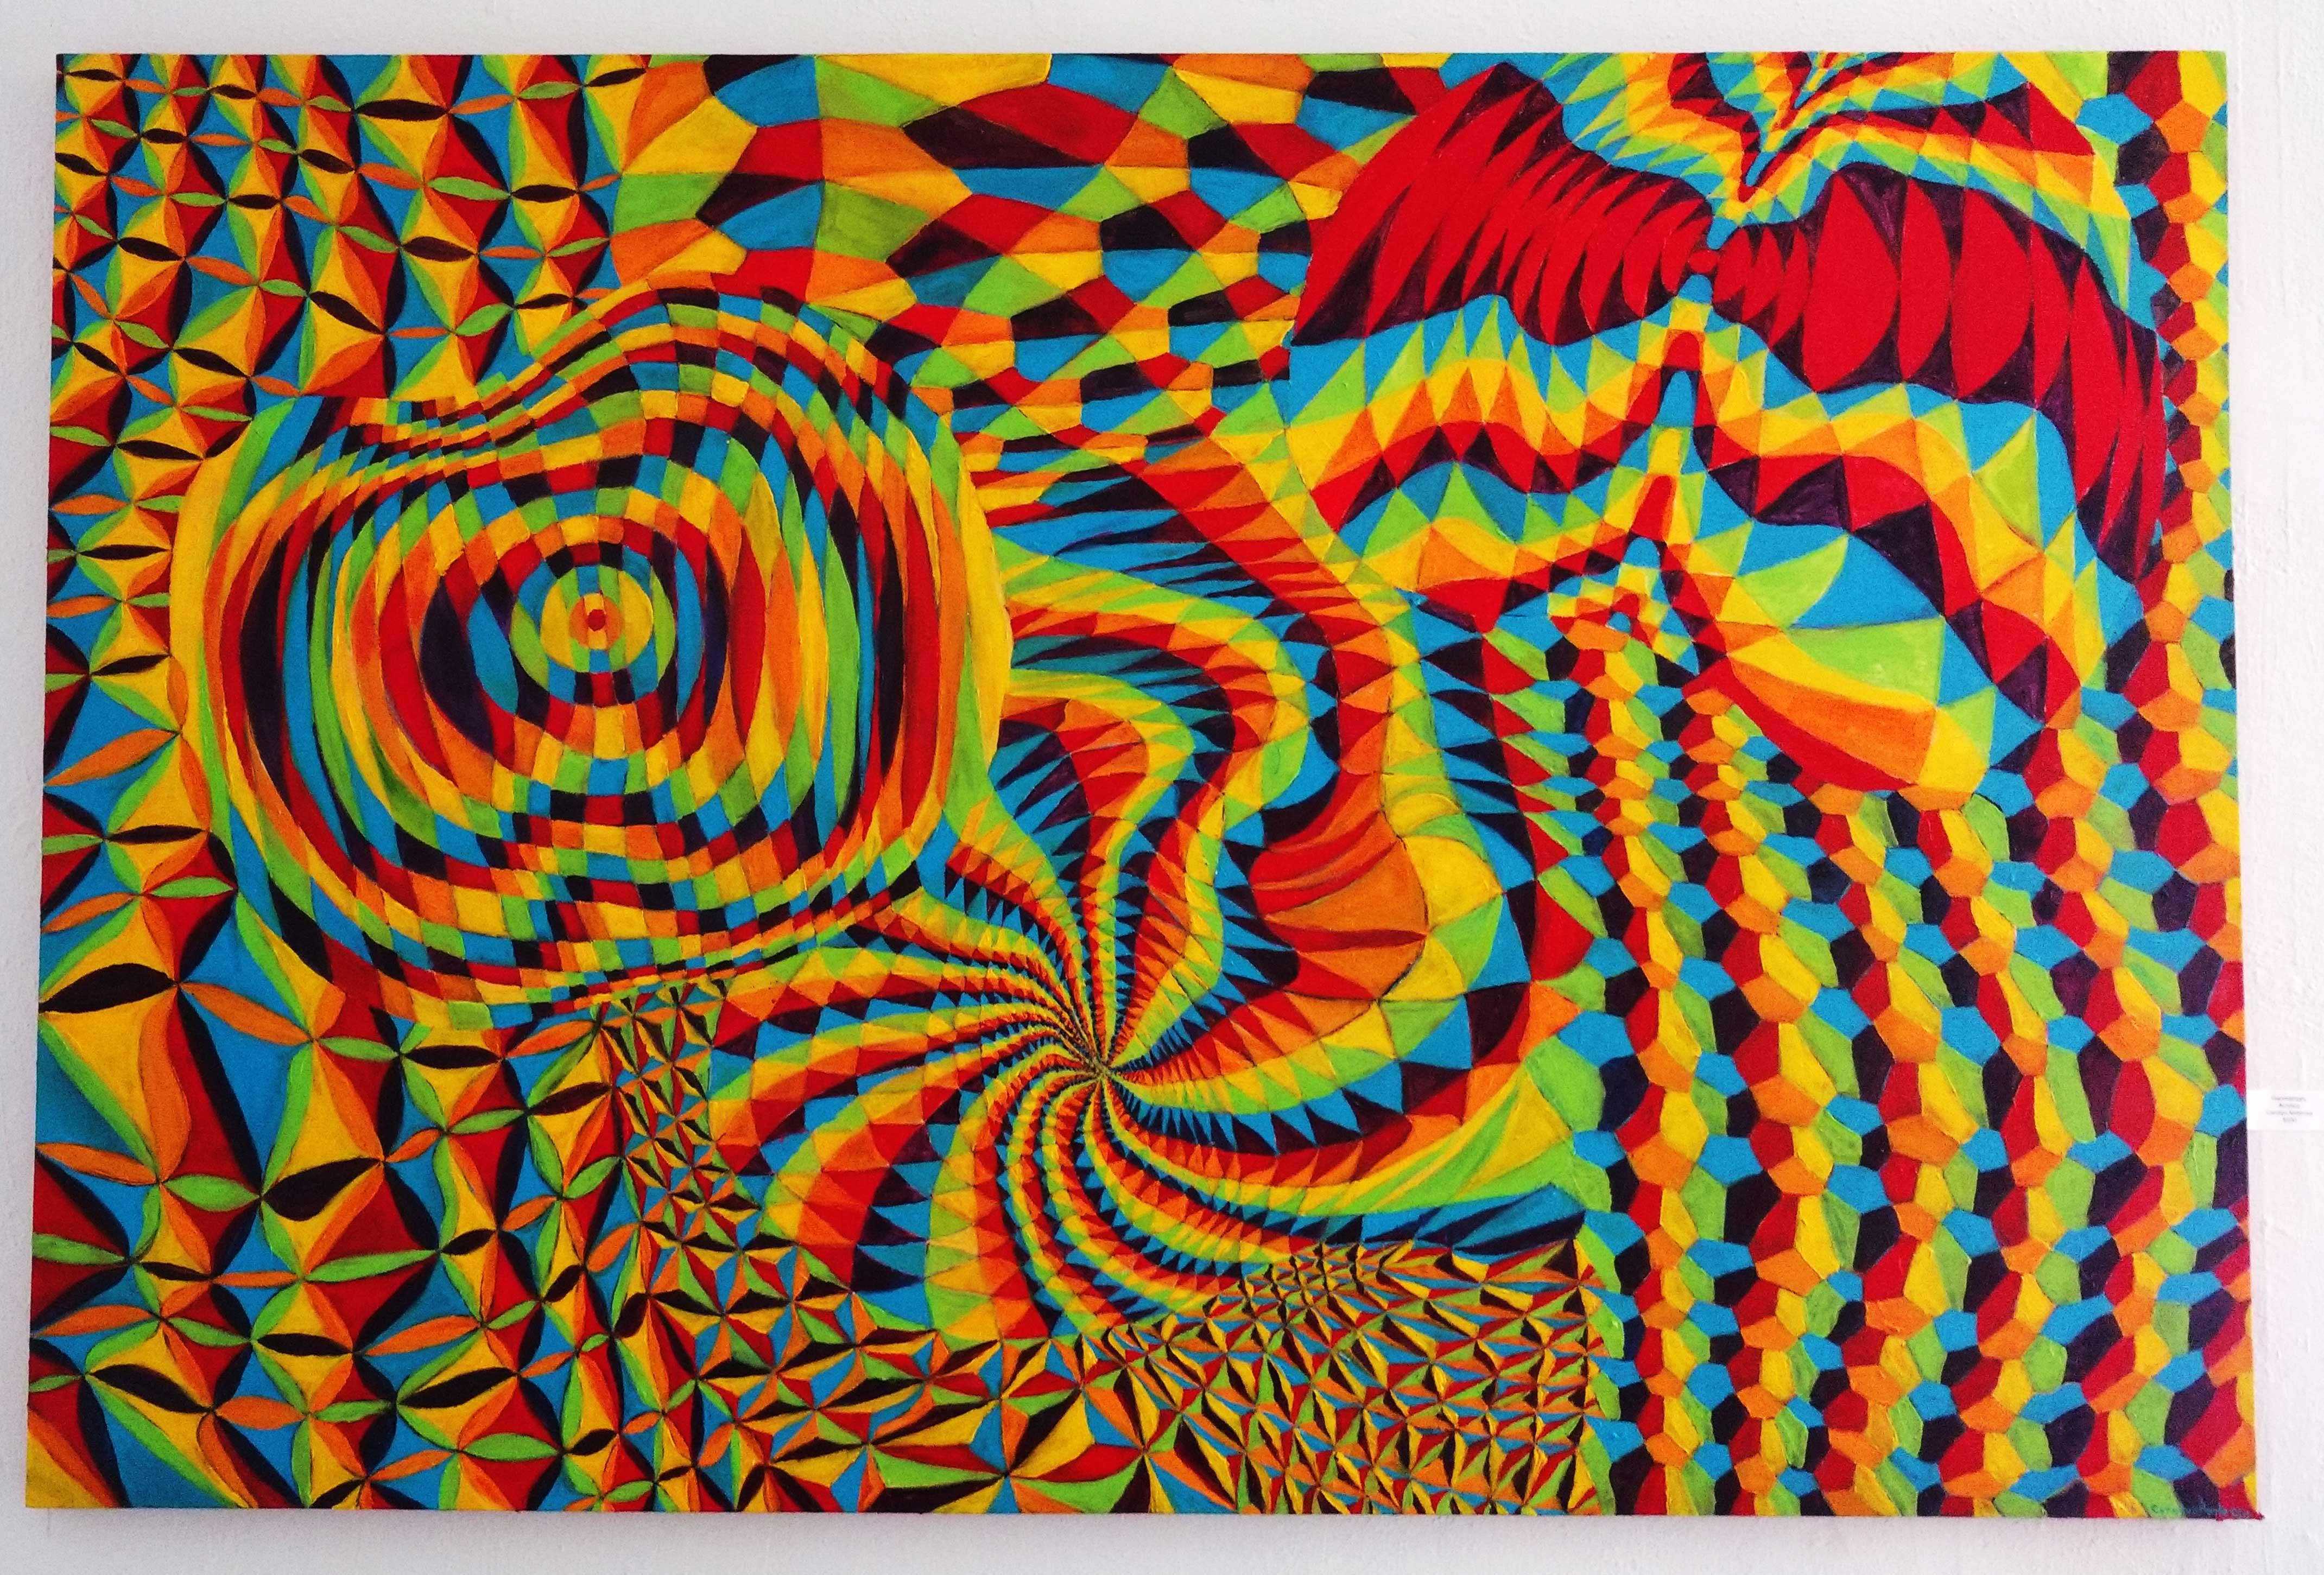 "'Geomatrippy"" Acrylic on Canvas by Caroline Ambrose"